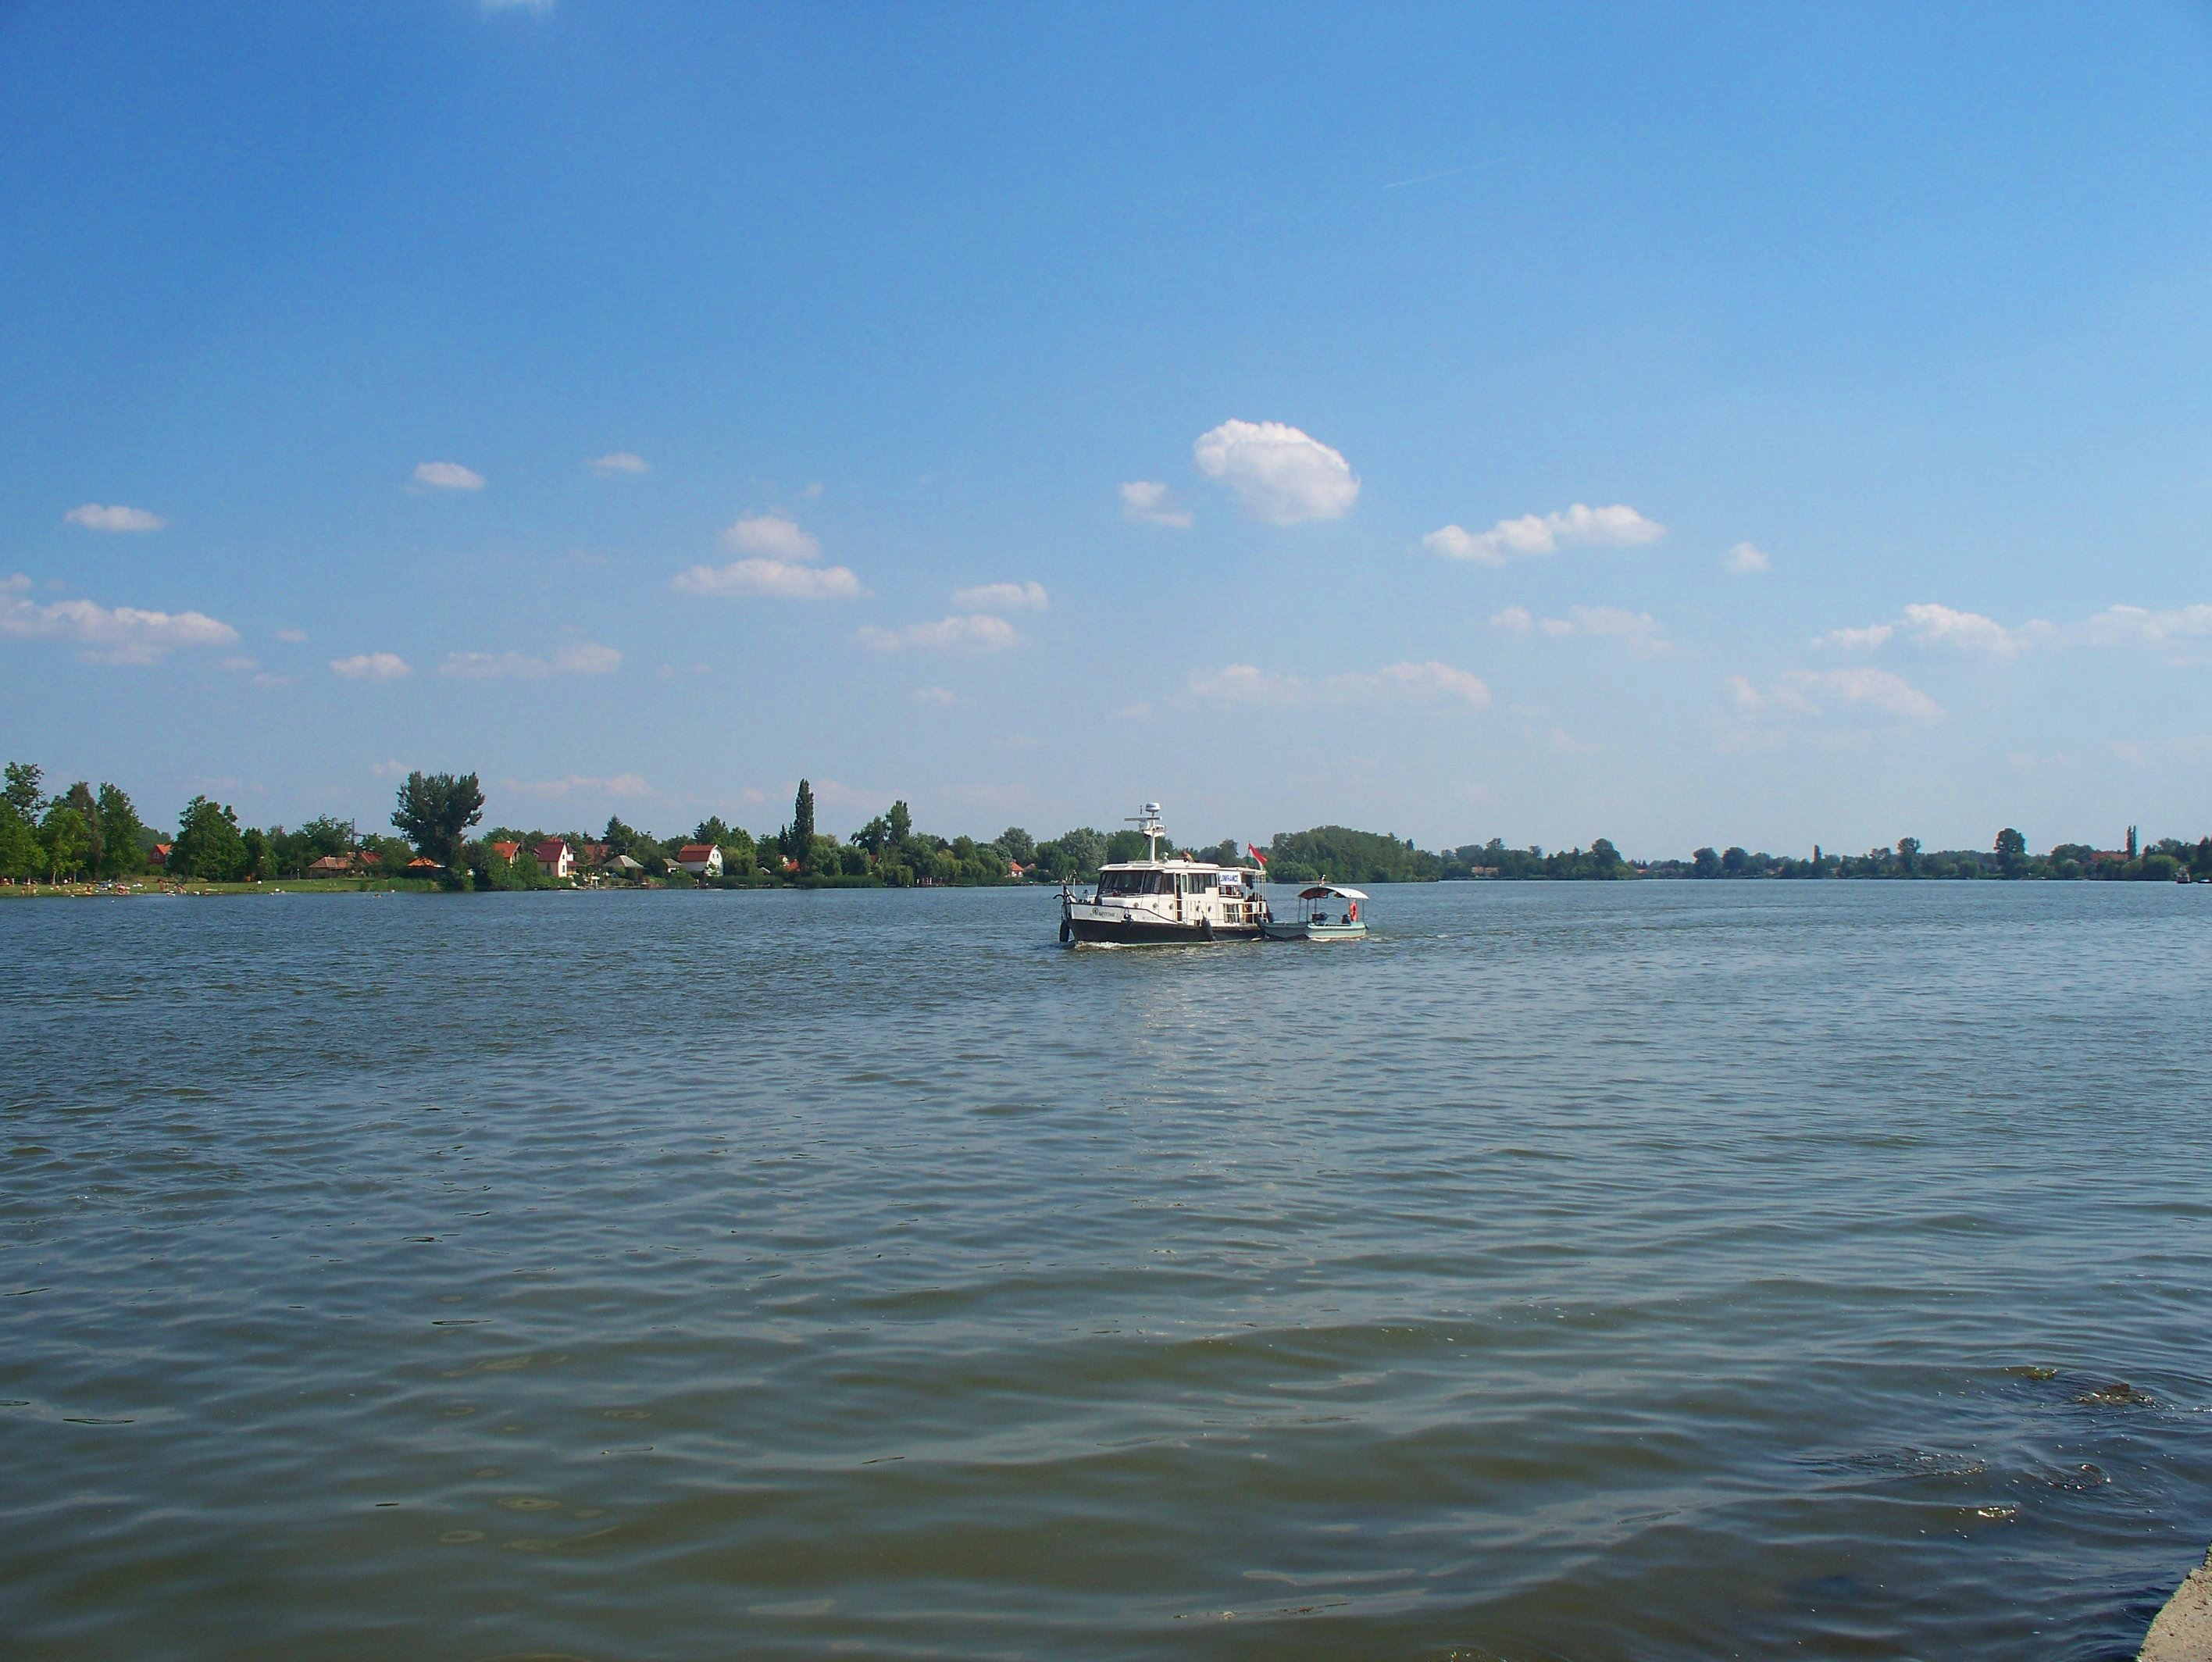 http://www.kisdunainagyhajok.hu/egyebhajok/2012_06_24_maritime_motoros_vontatohajo_a_rackevei-hidnal/2012_06_24_maritime_motoros_vontatohajo_a_rackevei-hidnal_002.jpg